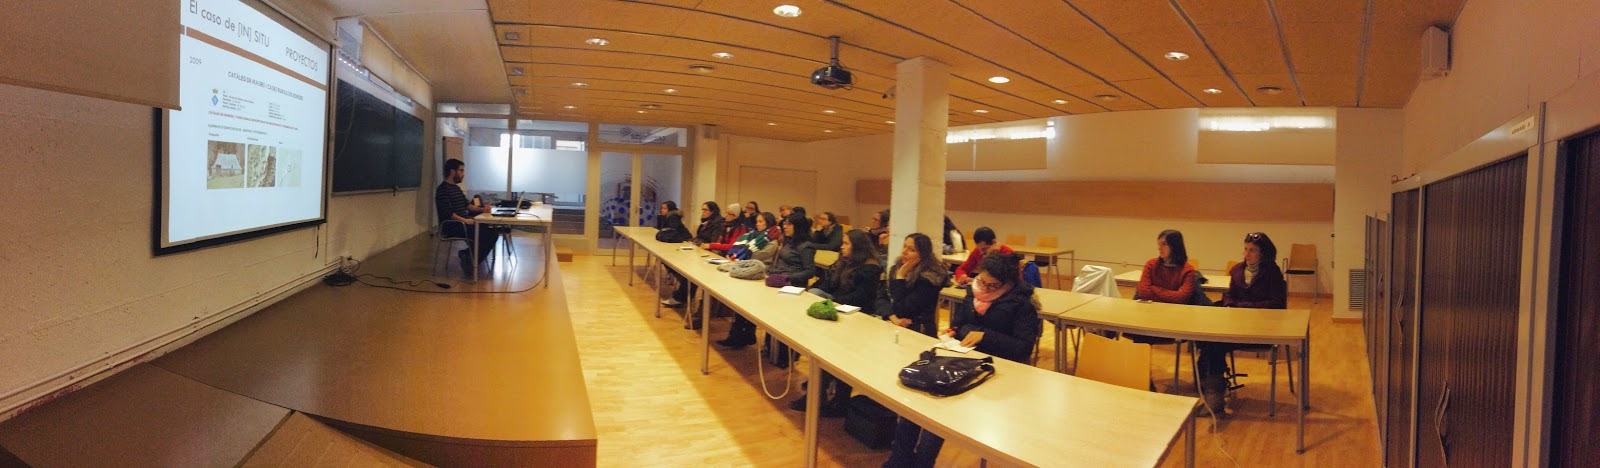 Jordi Seró Ferrer, fundador de [IN]SITU imparte una conferencia sobre un modelo de empresa cultural.